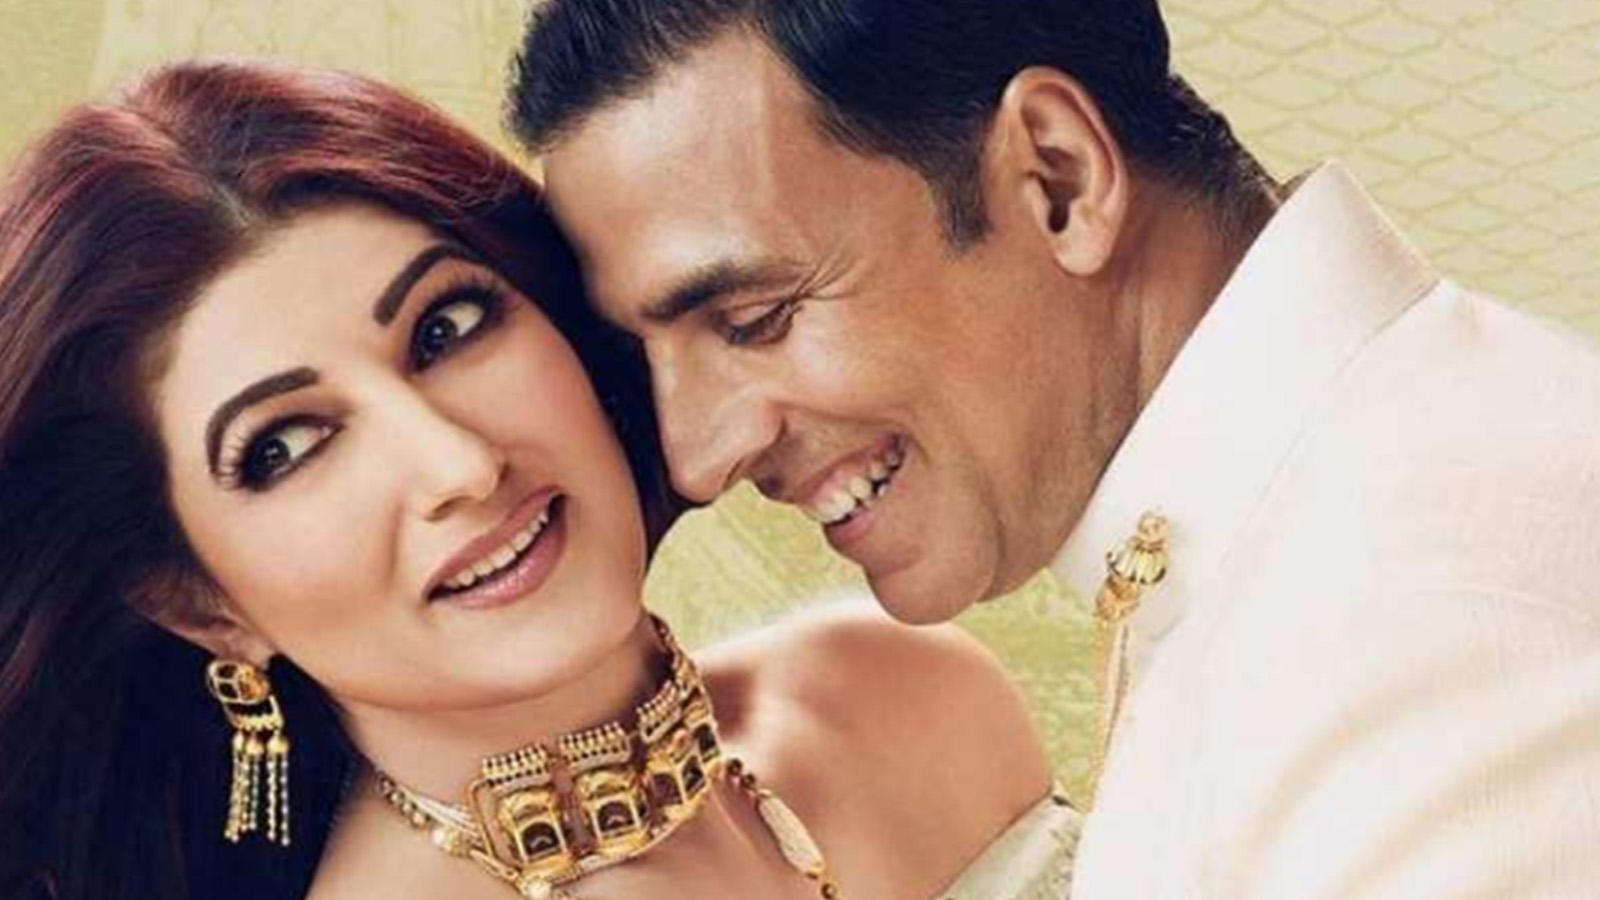 Twinkle Khanna on why she agreed to marry Akshay Kumar